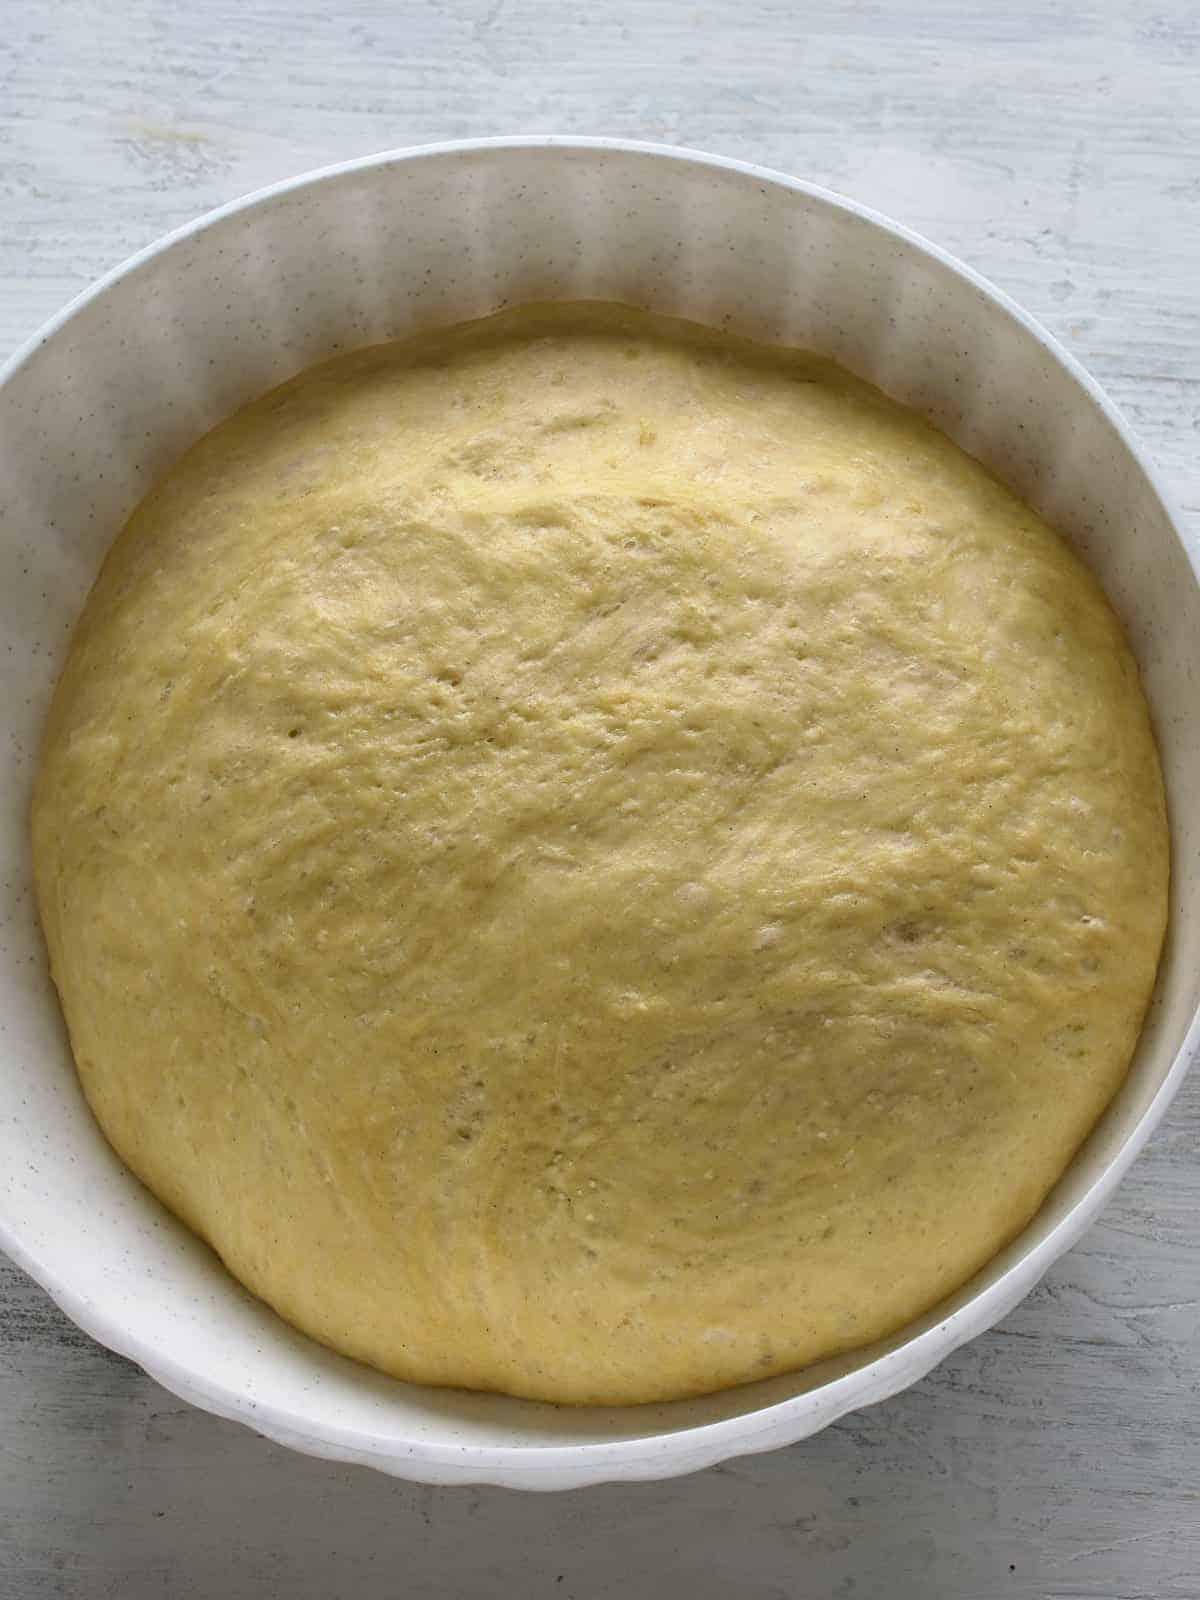 yeast dough proofed